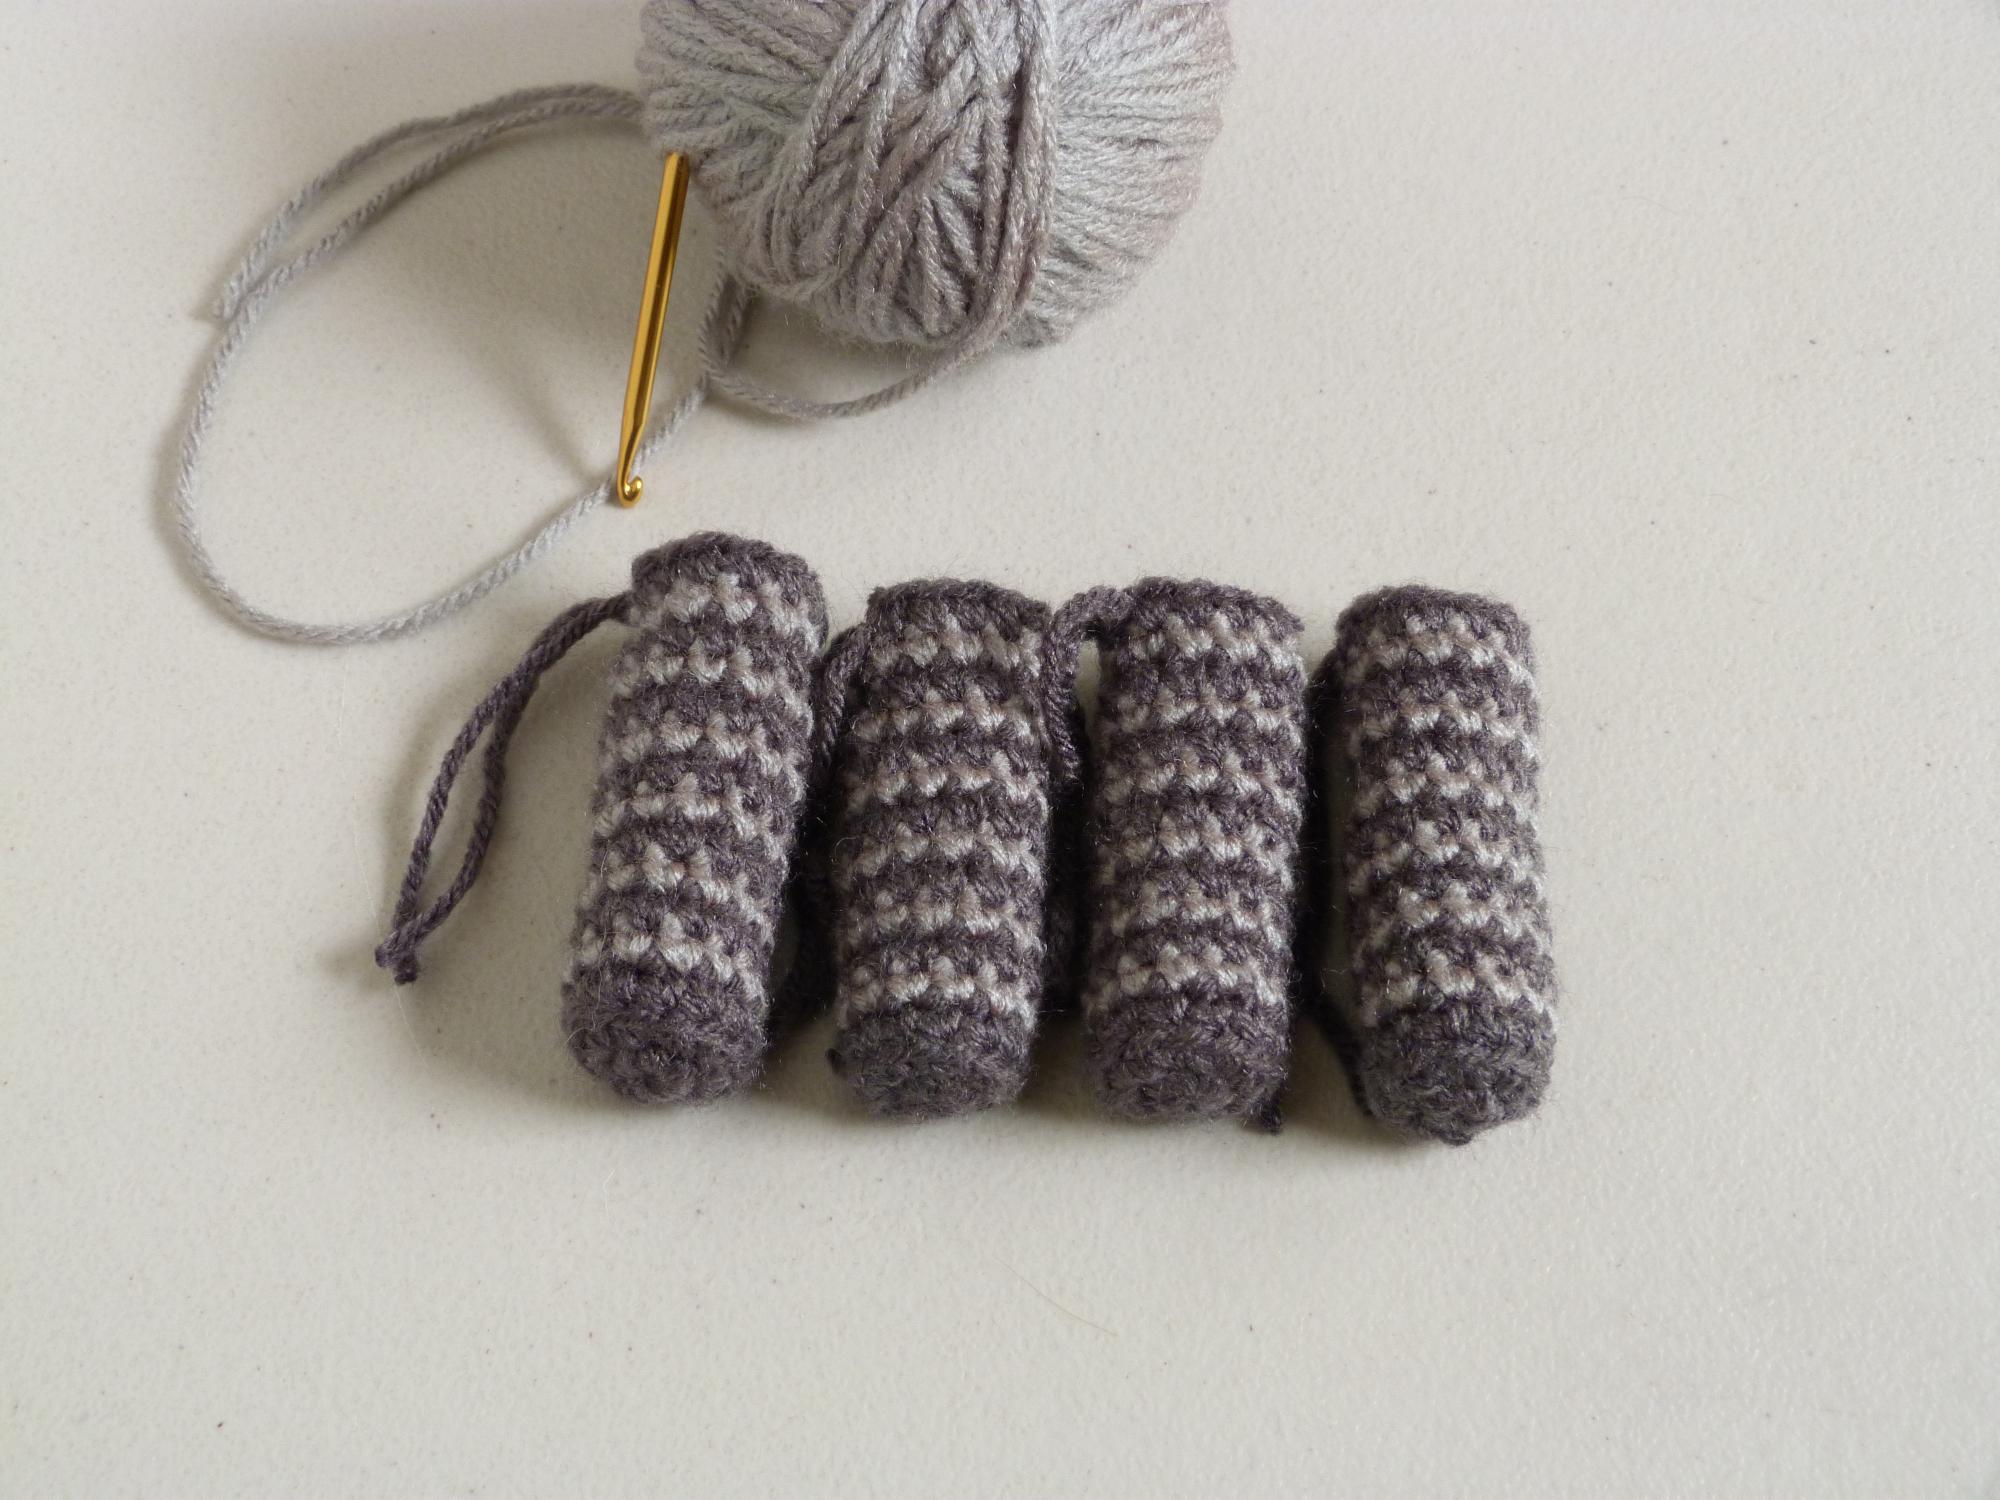 3. Crochet Chair and Table Socks